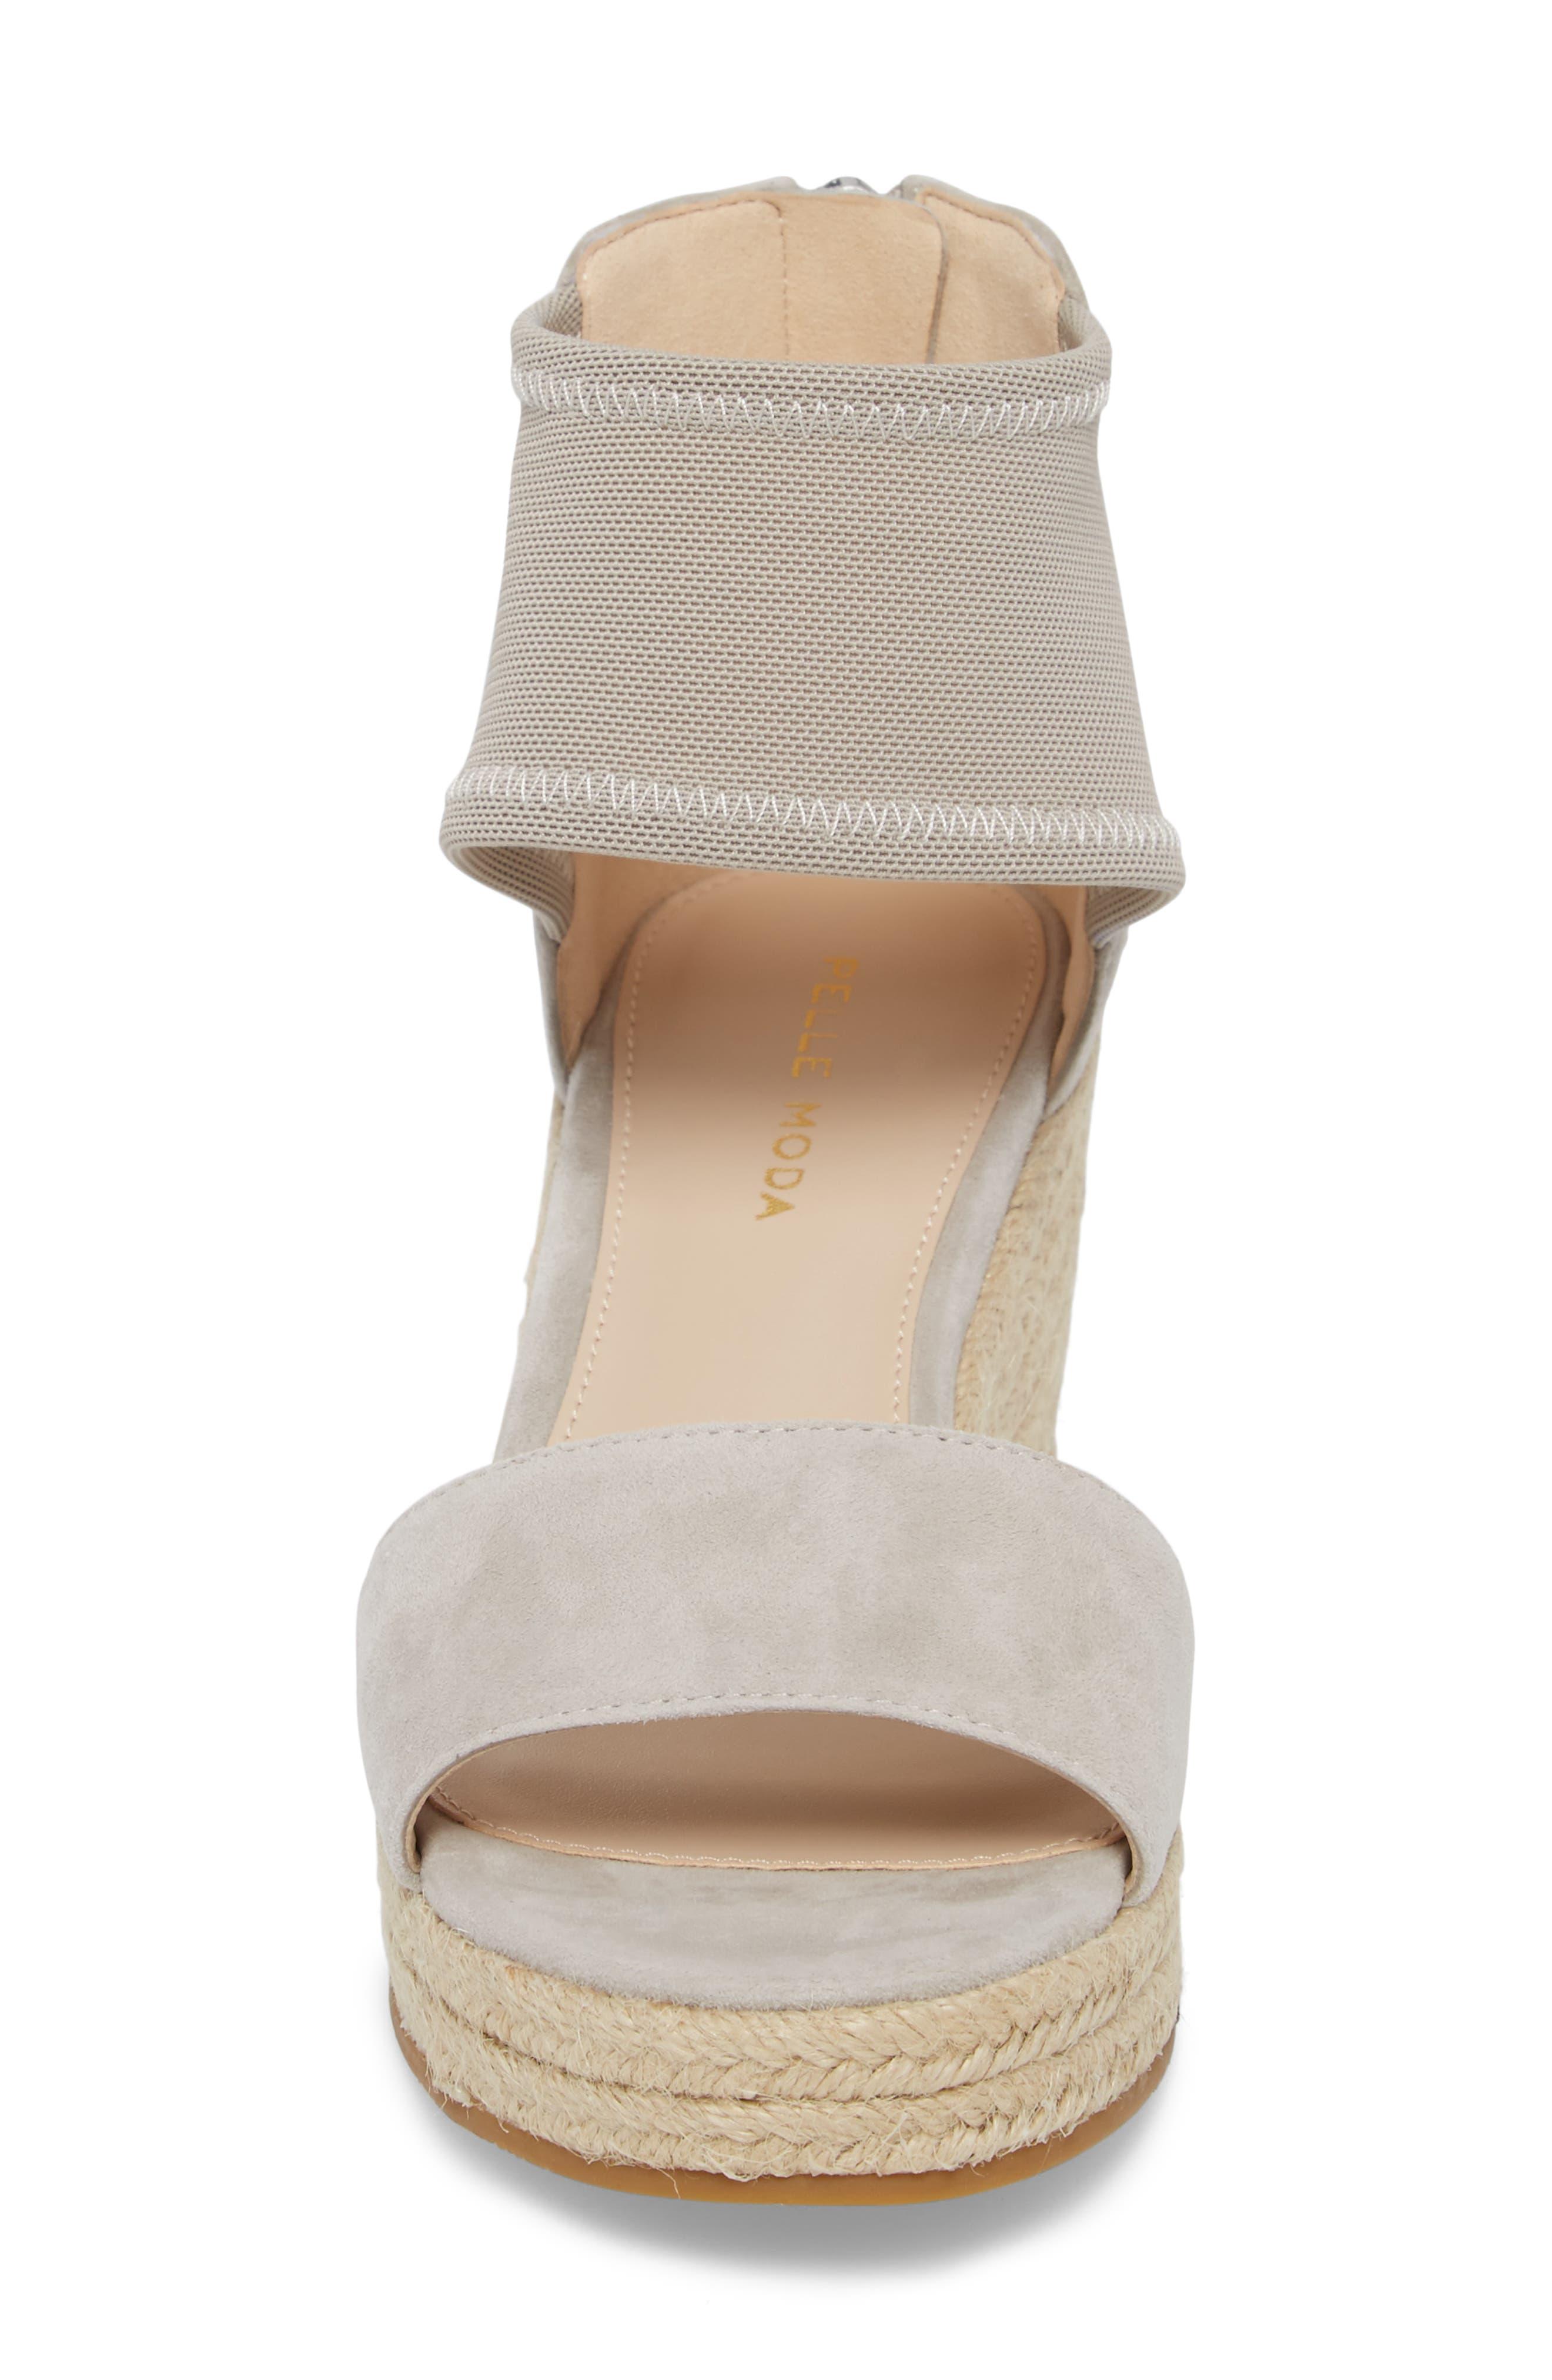 Kona Platform Wedge Sandal,                             Alternate thumbnail 4, color,                             CLOUD SUEDE